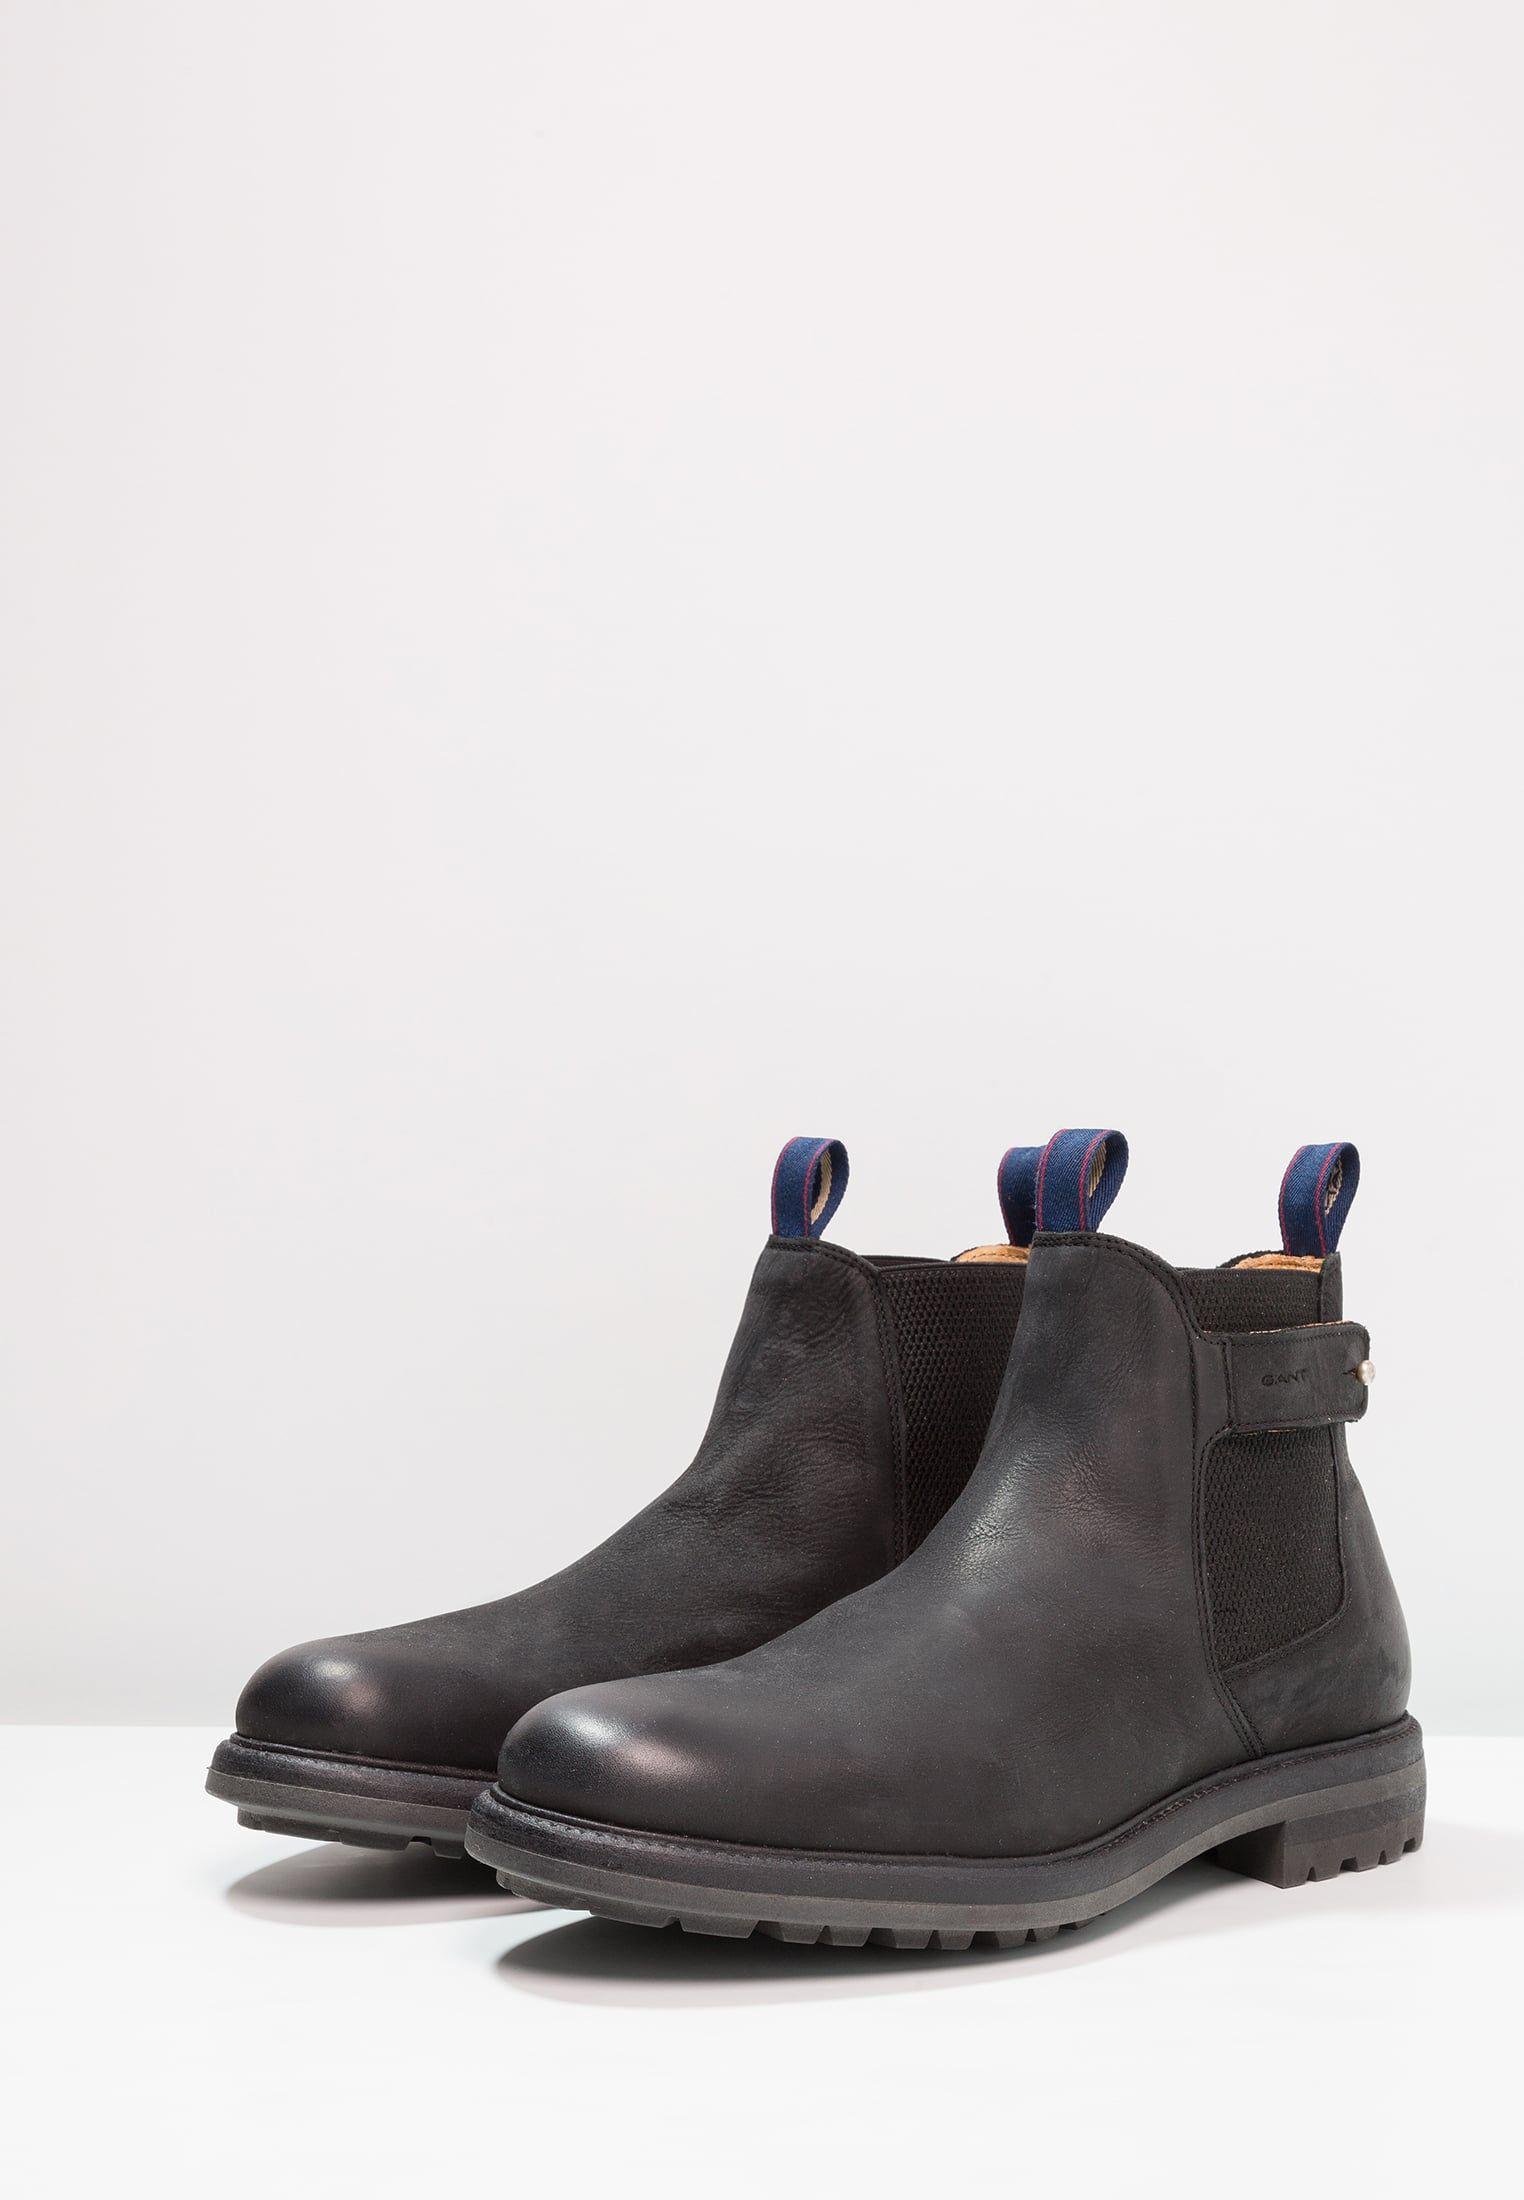 Nobel Scarpemania Boots Gant Zalando Stivaletti it Black BOWdW8q